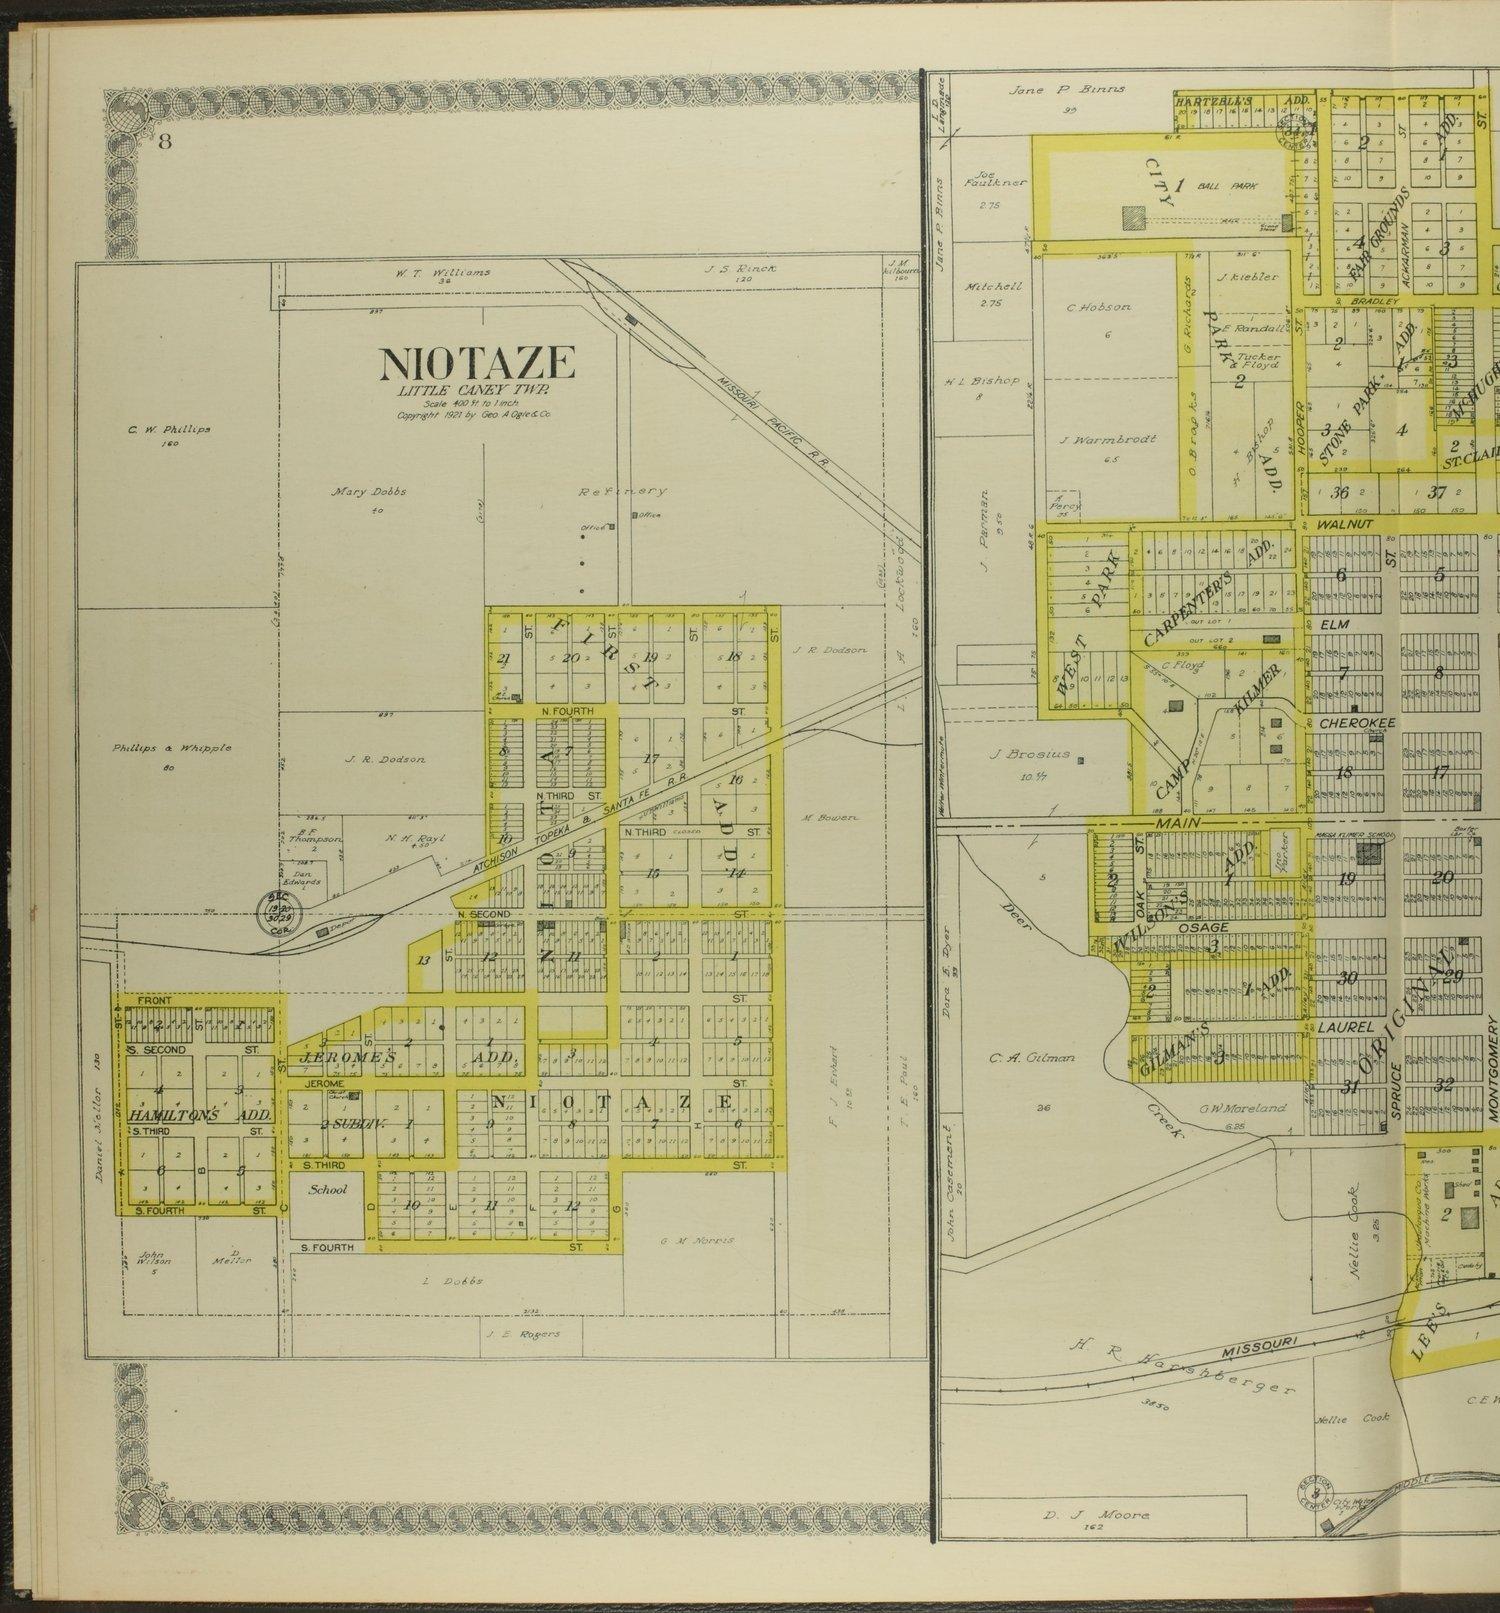 Standard atlas of Chautauqua County, Kansas - 8